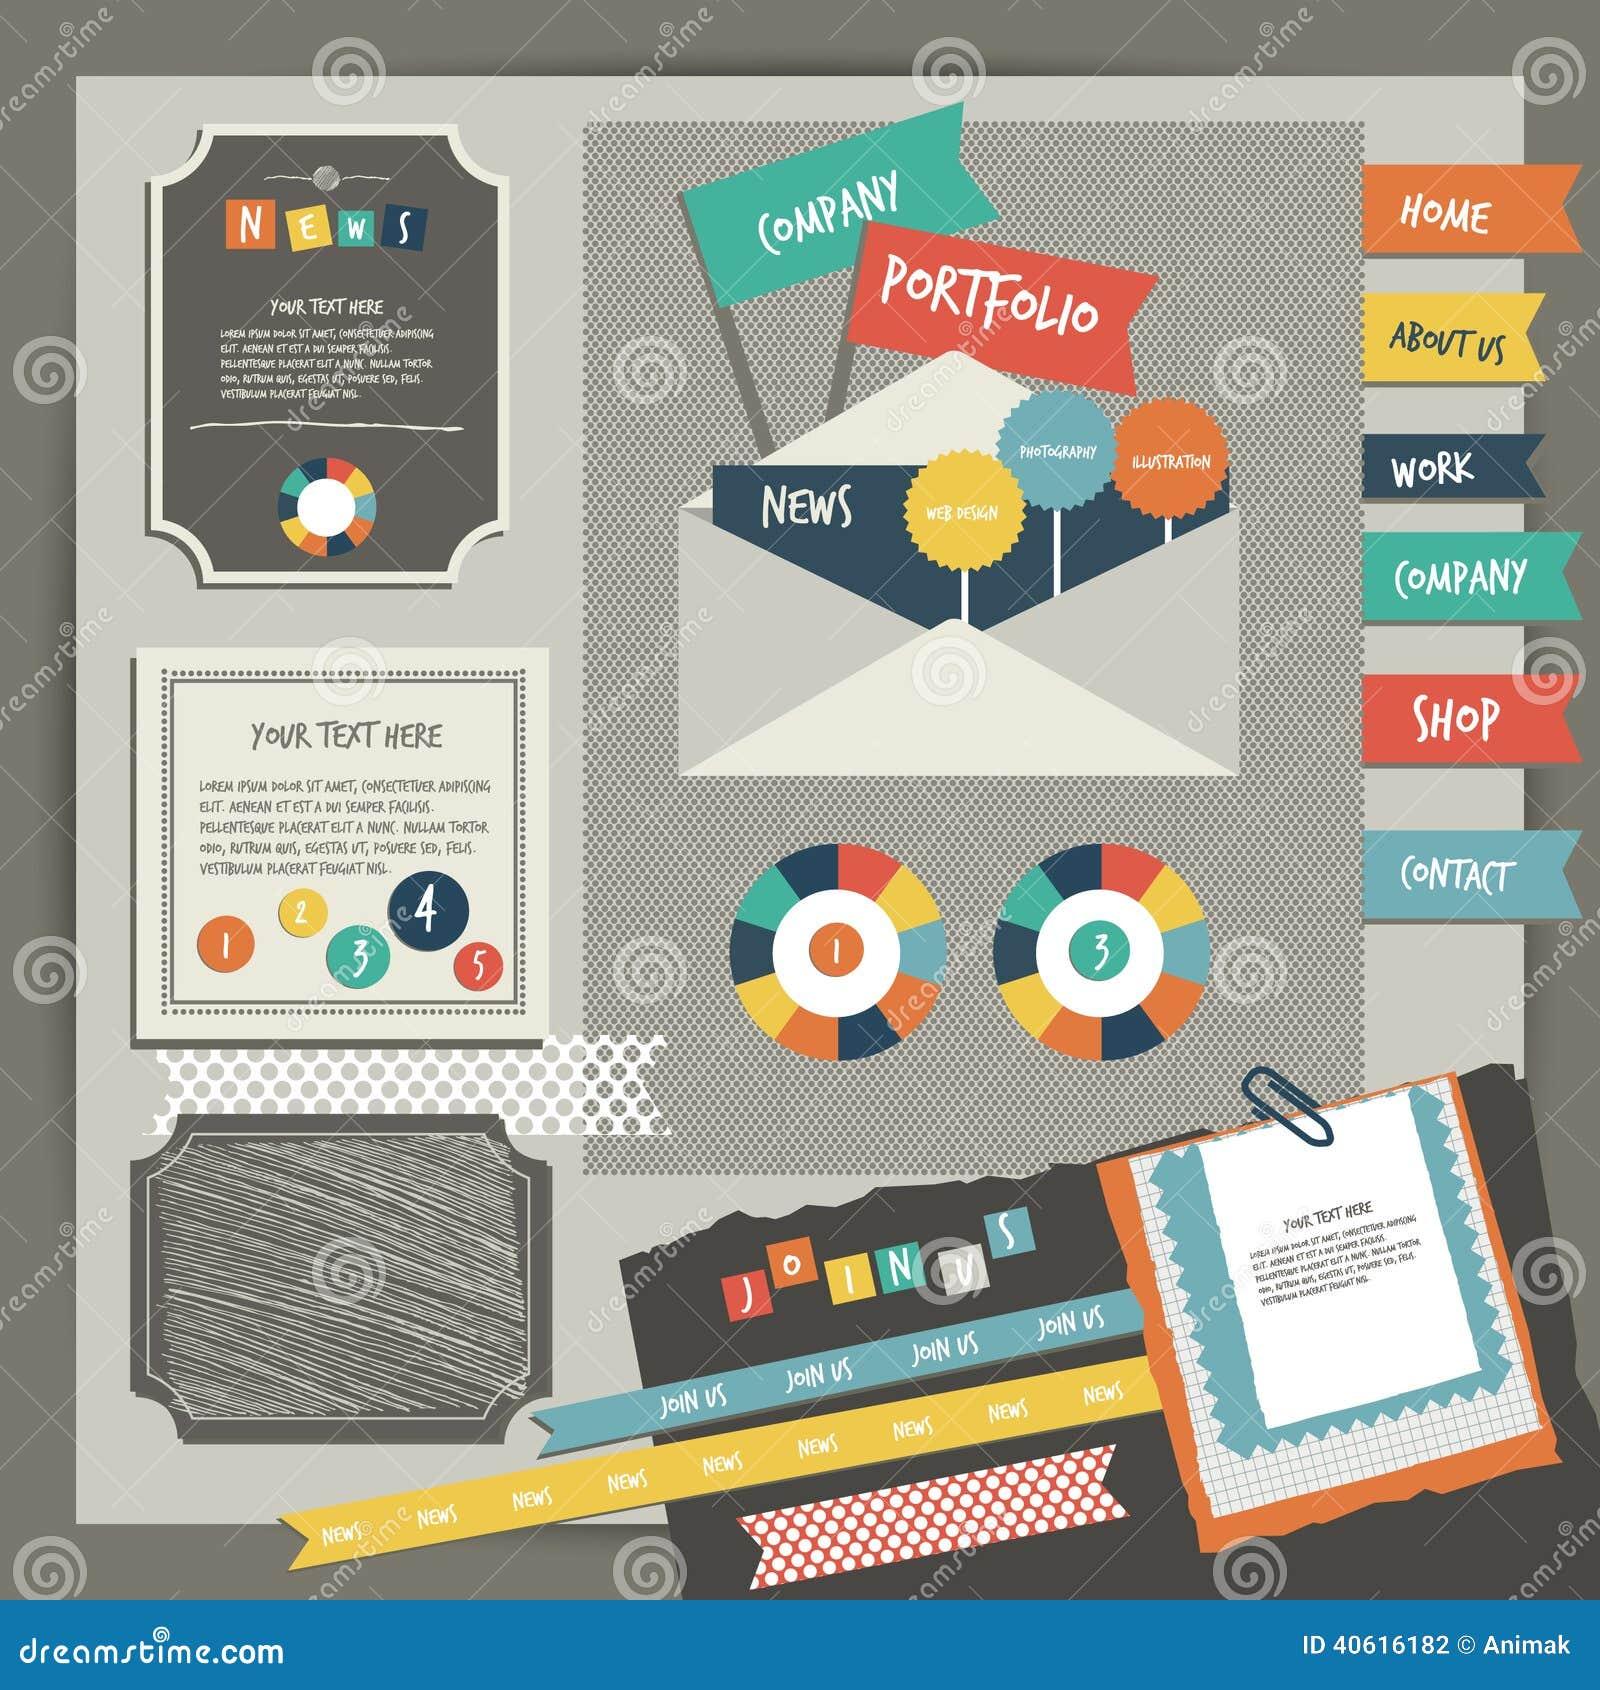 Web Design Vintage Portfolio Elements. Collection Stock Vector - Image ...